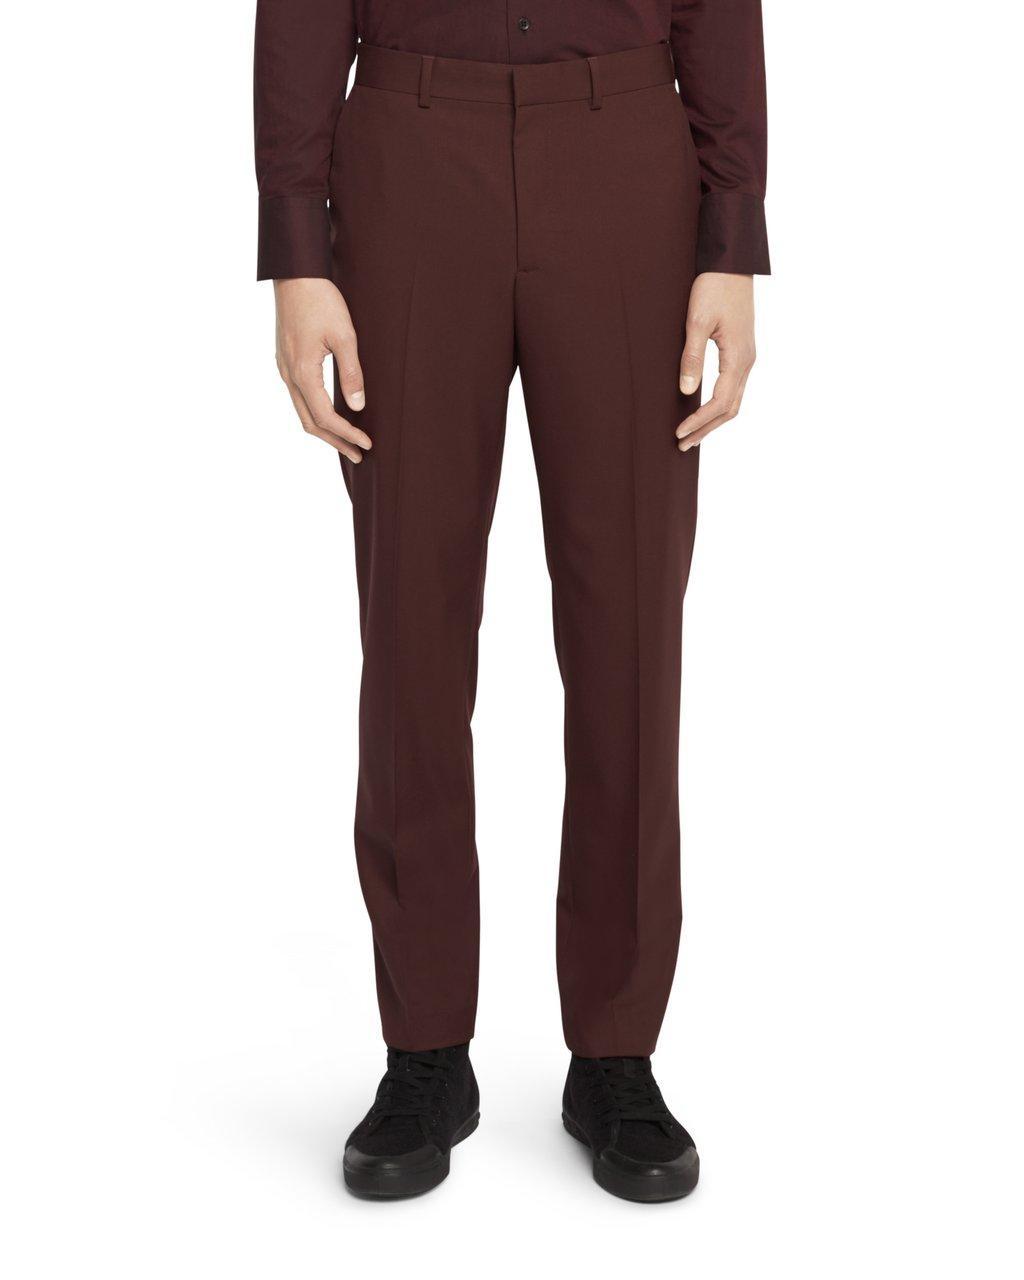 Razor Mens Casual Shorts Pants